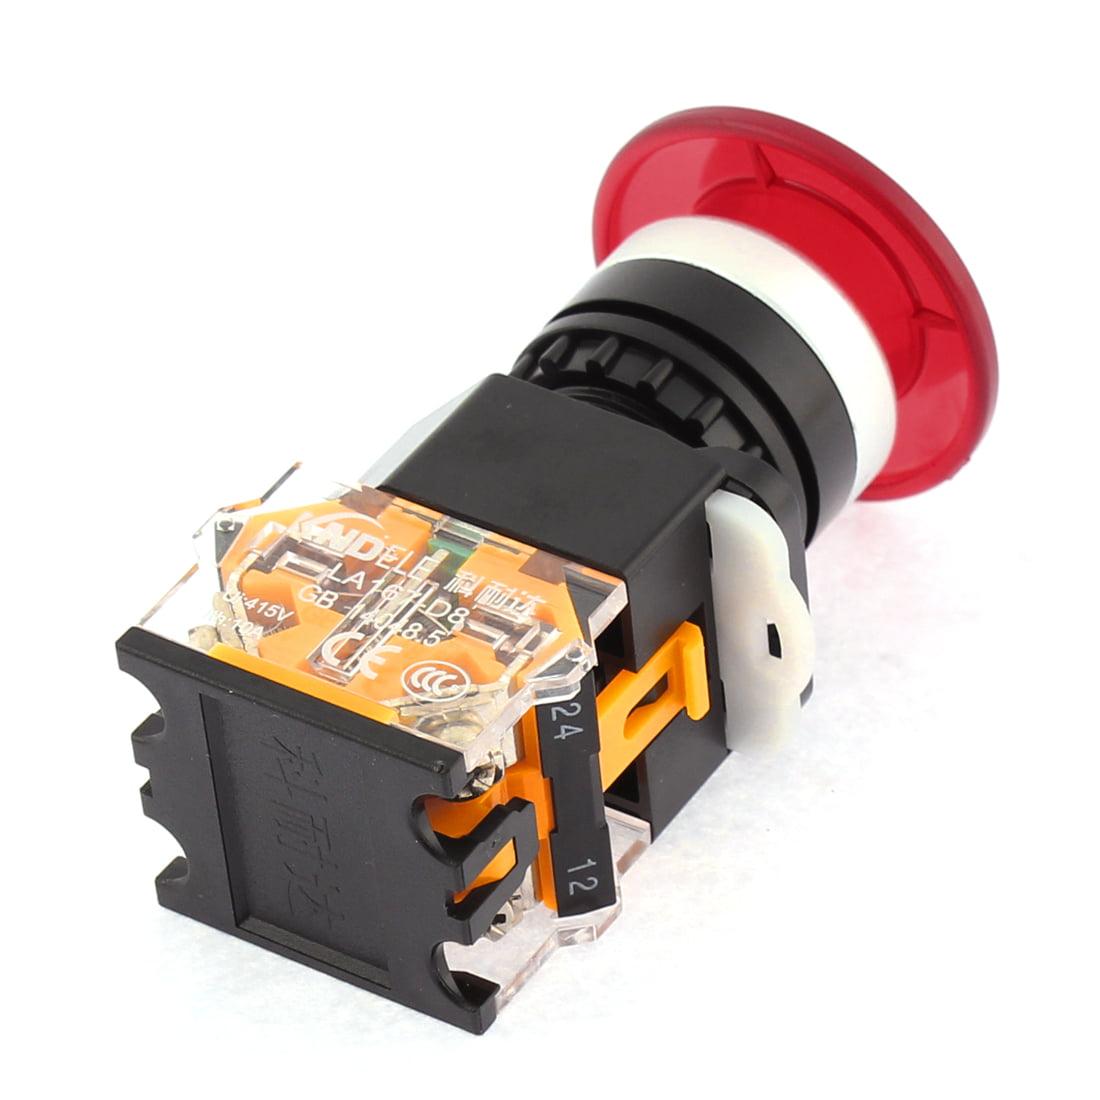 Honeywell 6243850-37//7 Ascender CI SRC Size 37 S3